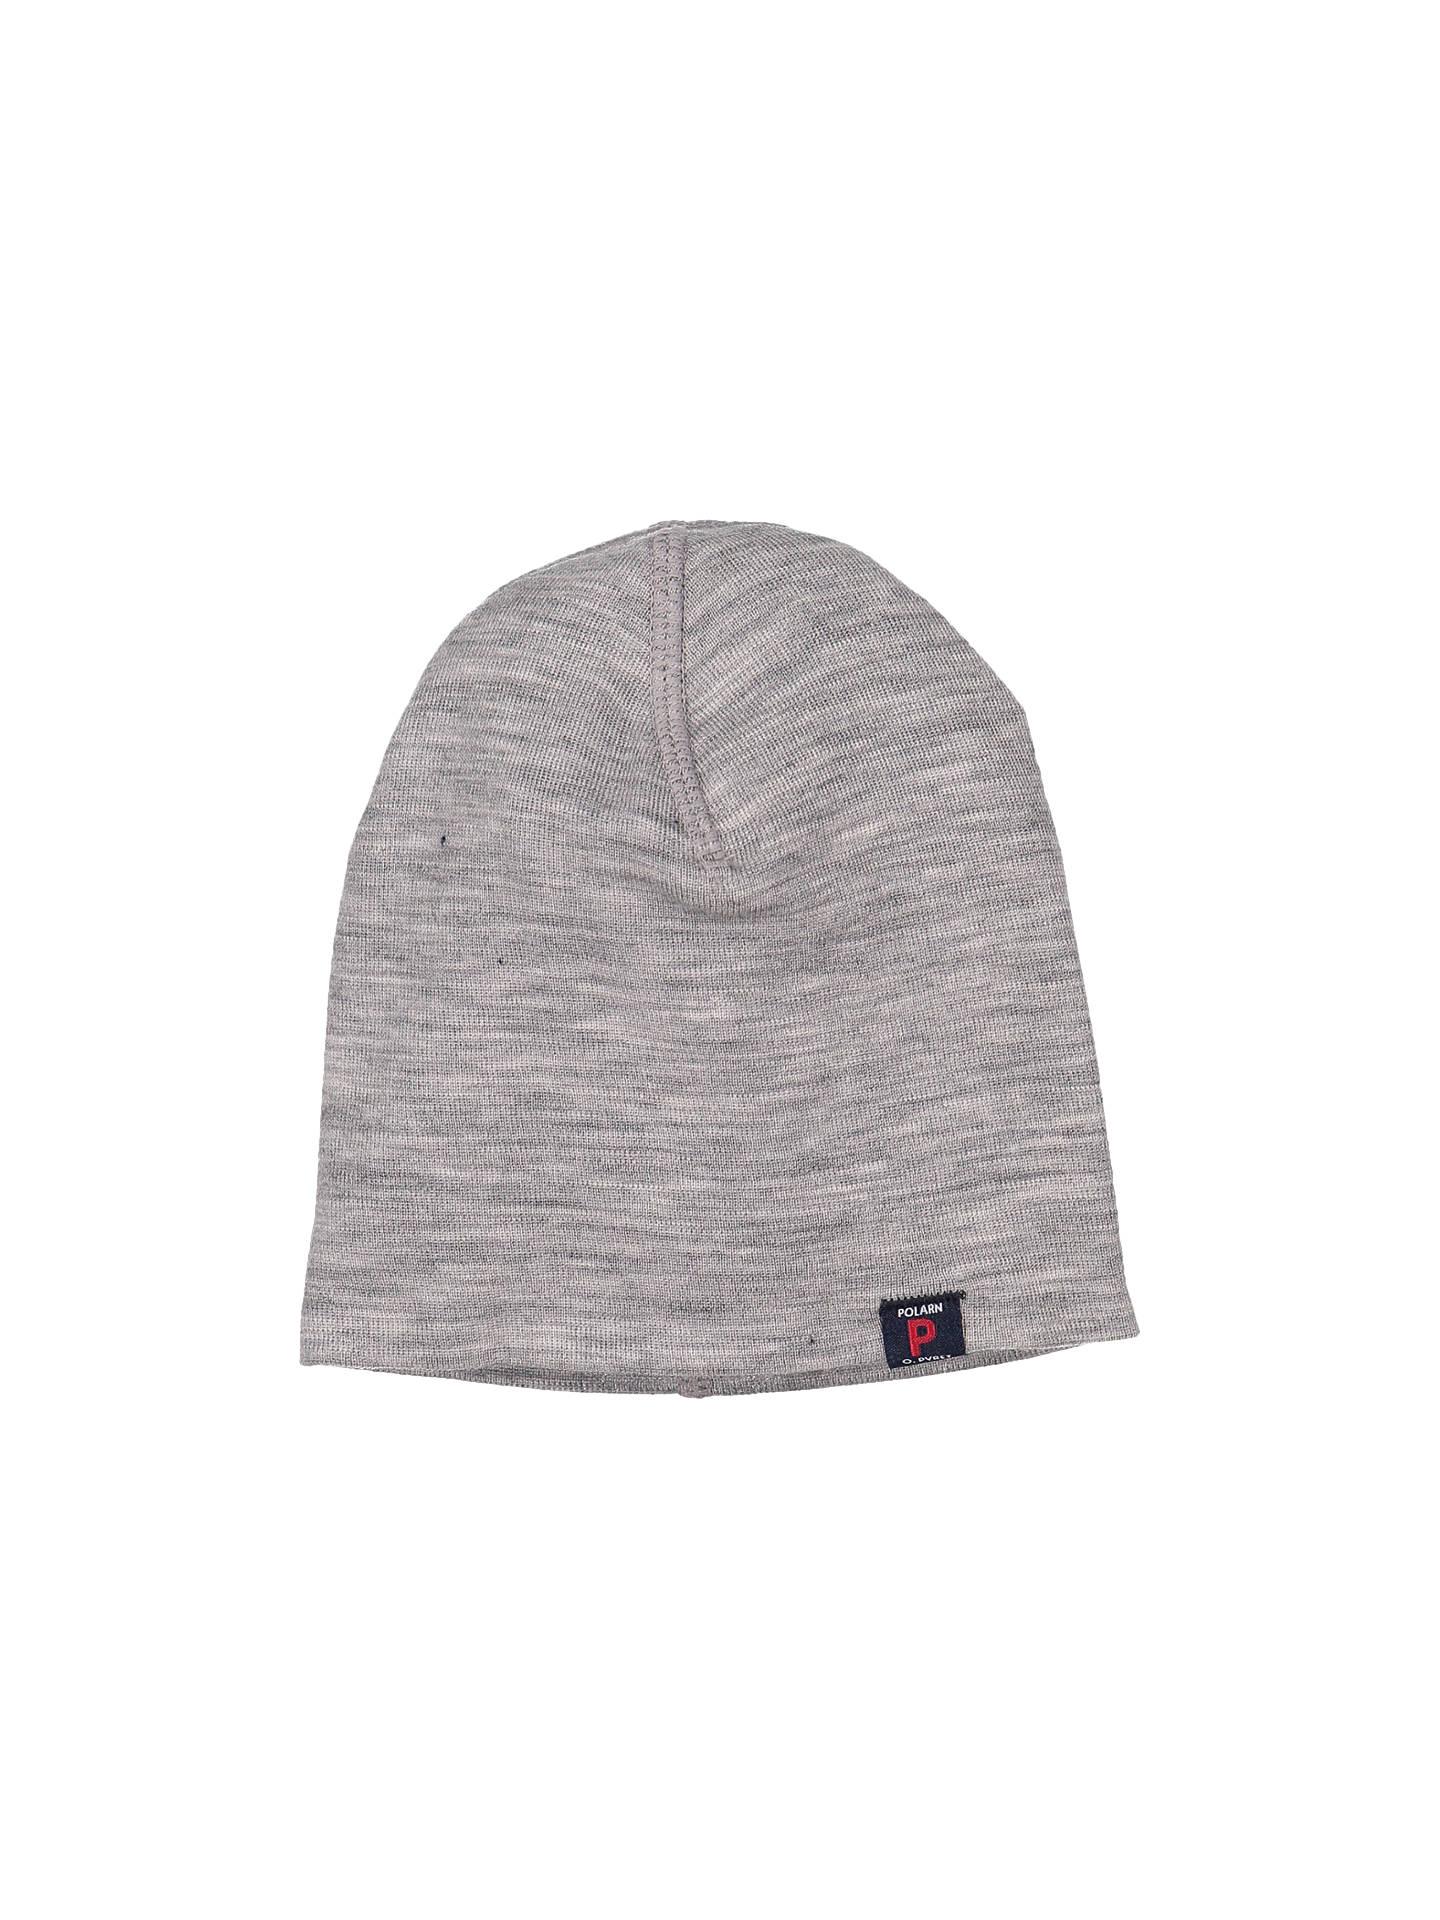 984eb508c39bce Buy Polarn O. Pyret Baby Merino Hat